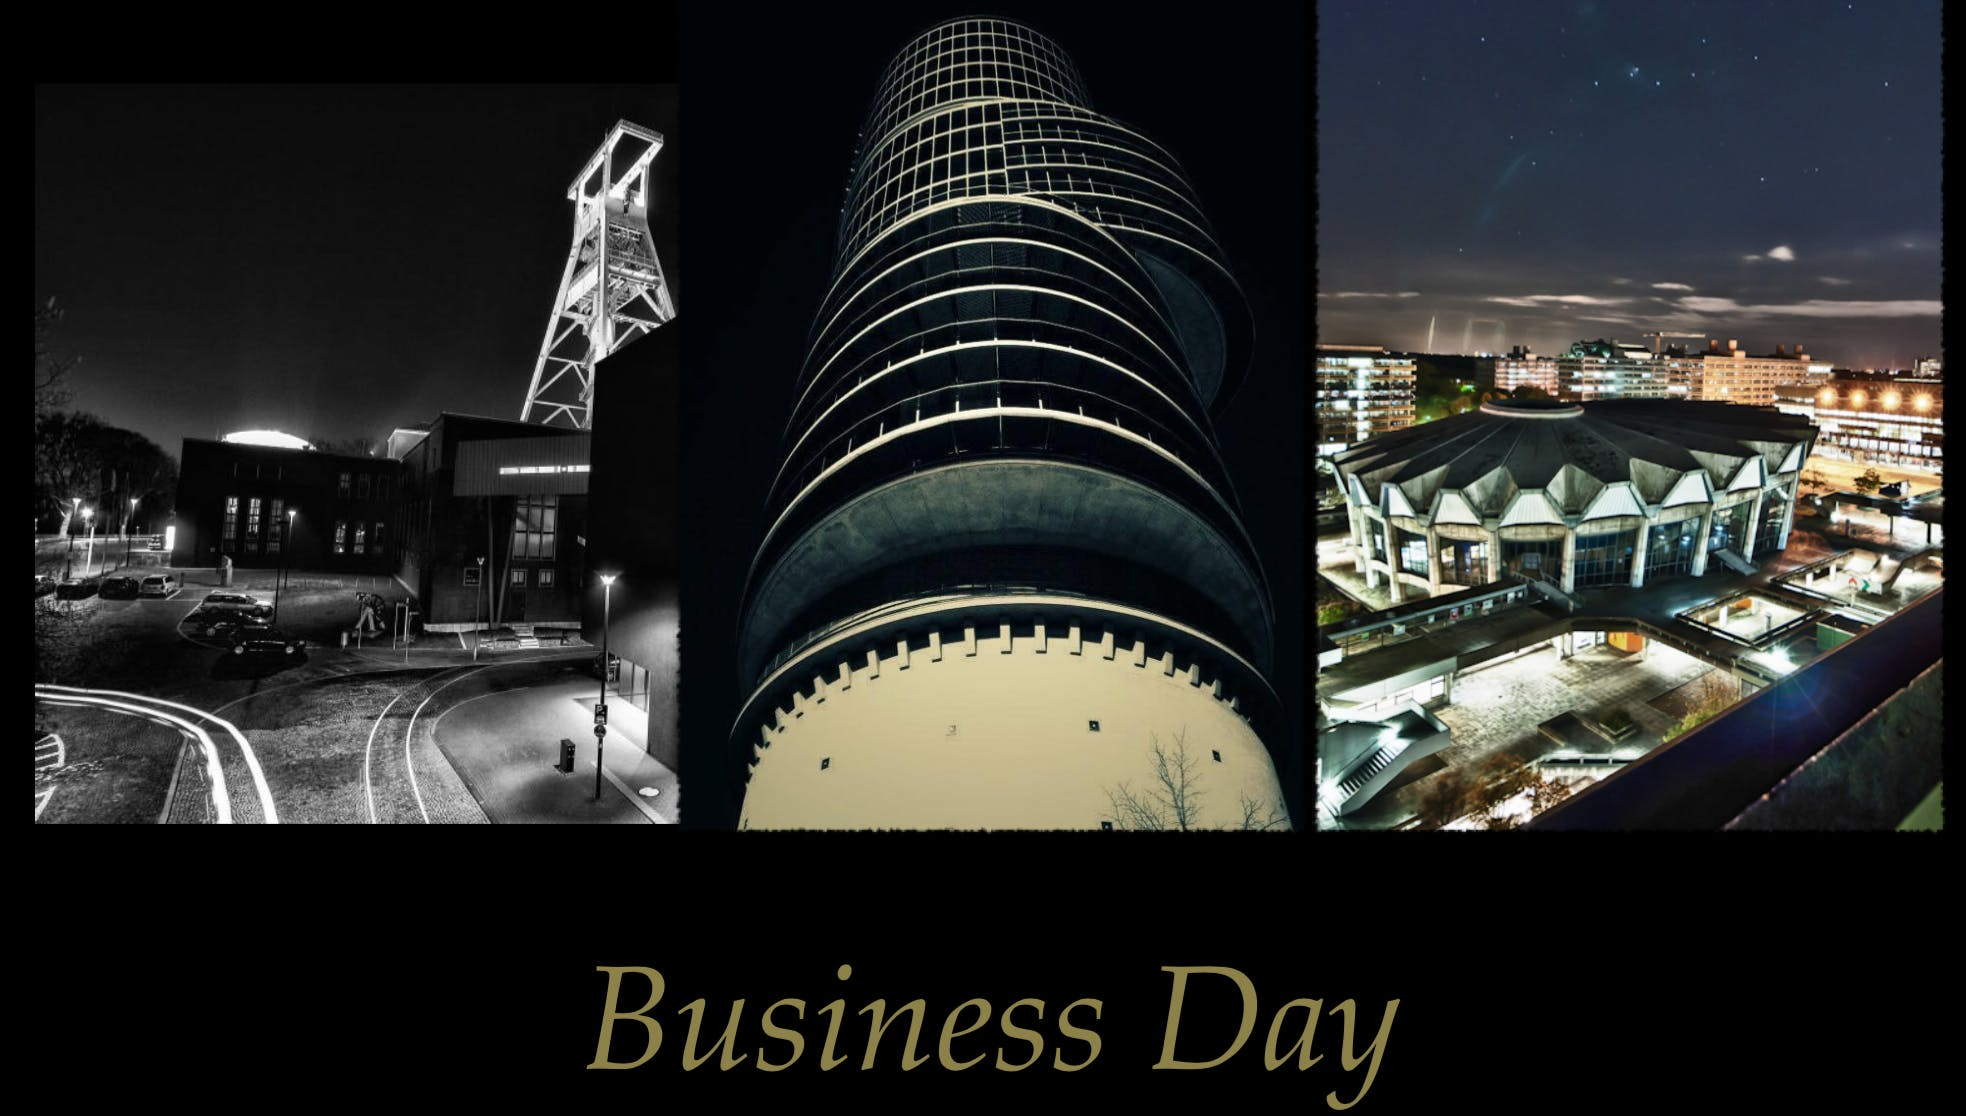 Business Day NRW